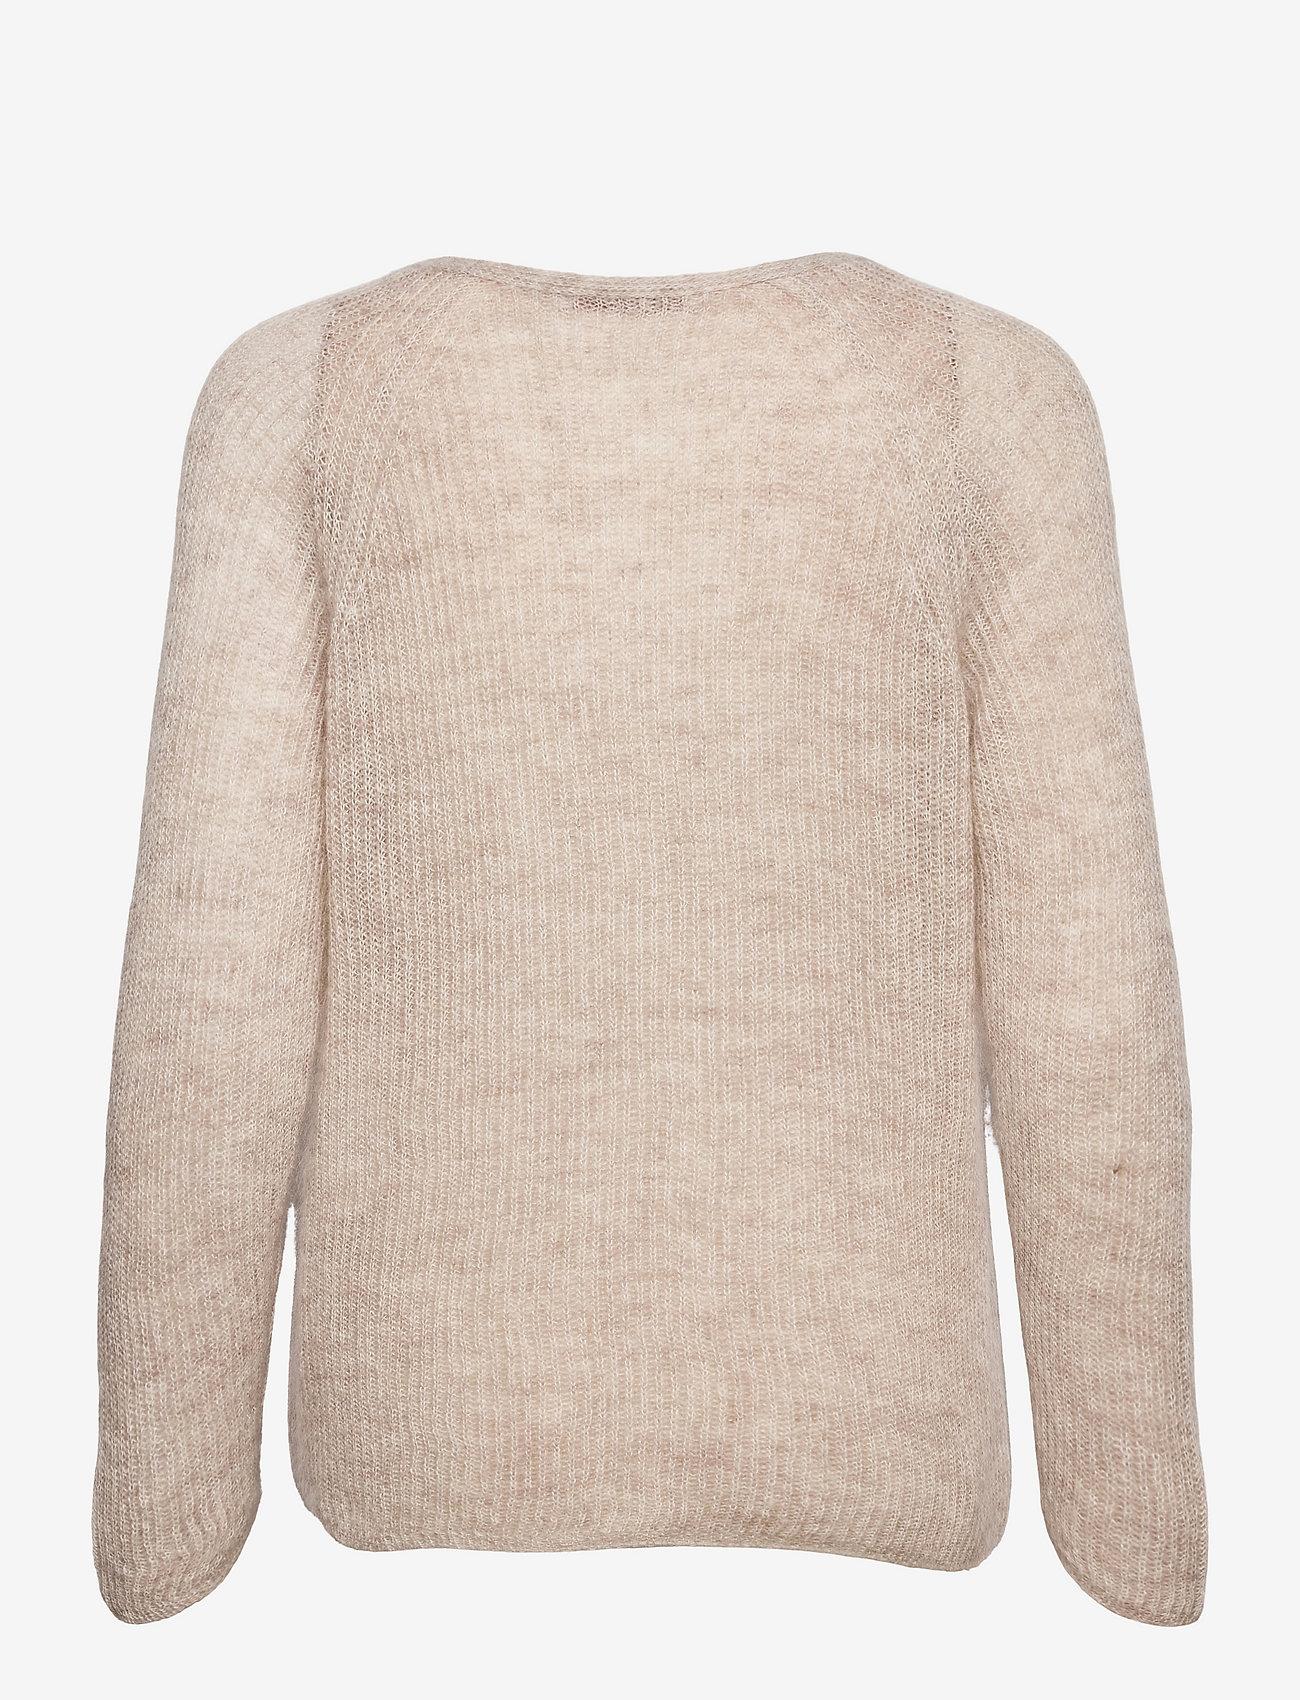 Max Mara Leisure - GATTONI - sweaters - beige - 1